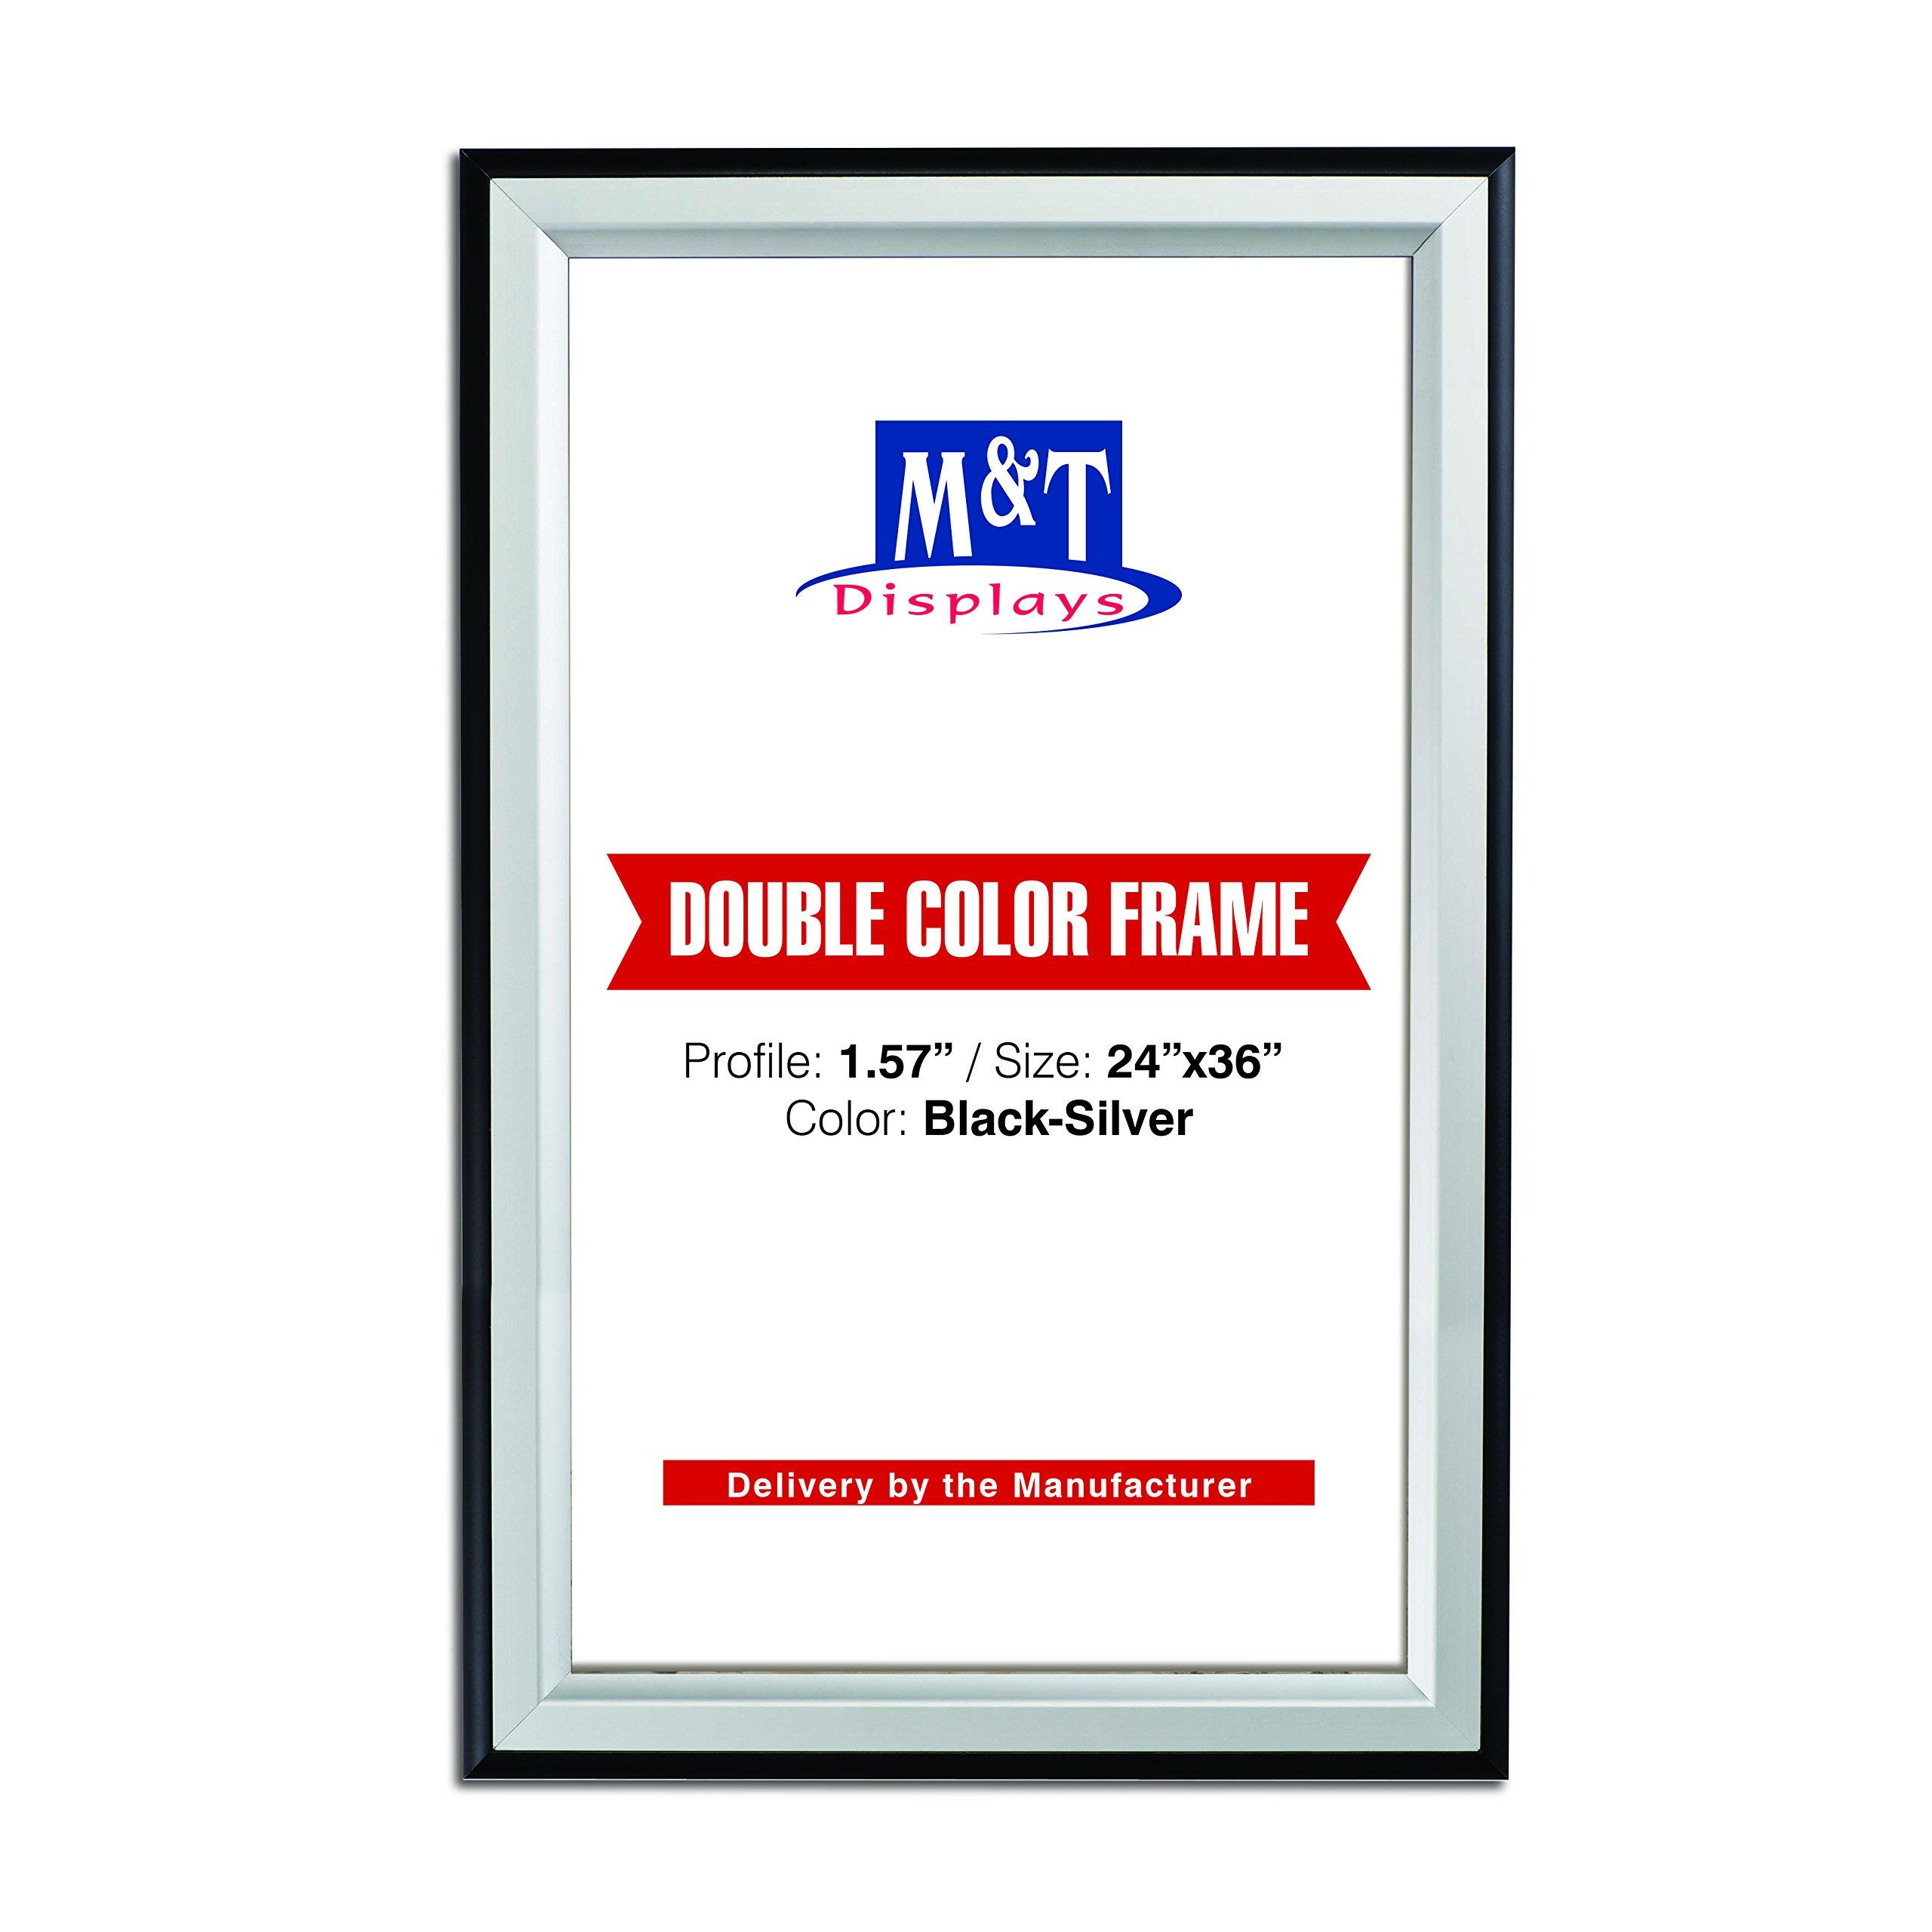 M&T Displays Double Color Snap Frame, Black-Silver Color Profile, Mitered Corner, 24X36 Poster Size, Front Loading